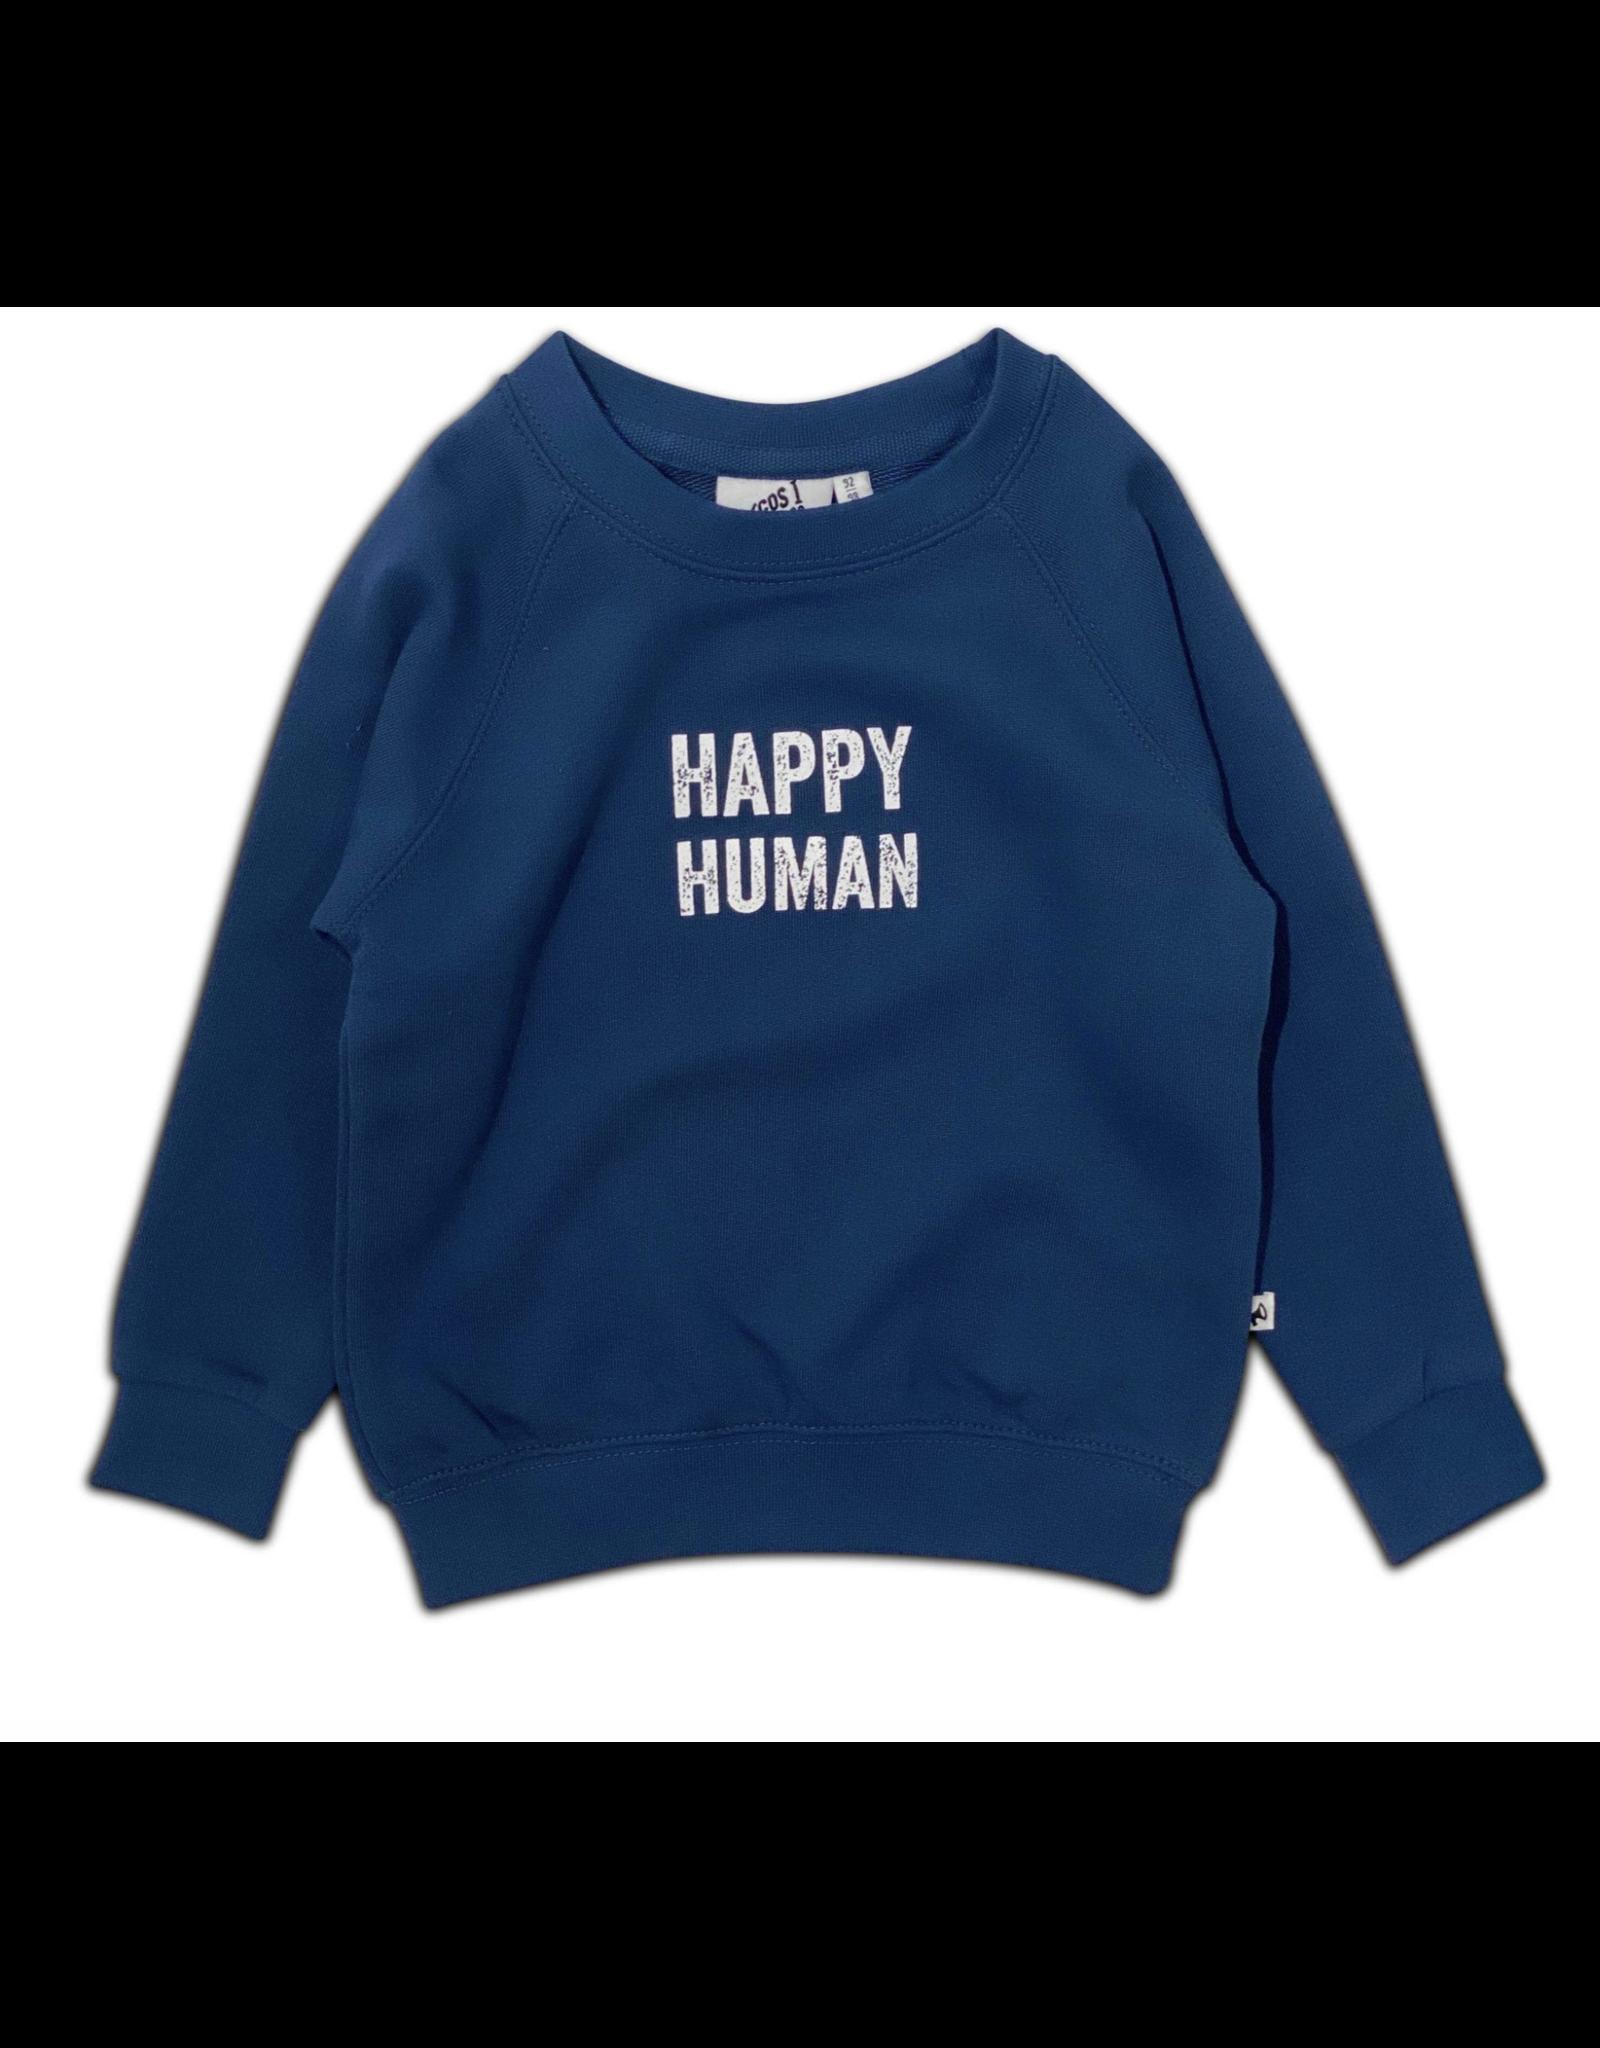 COS I SAID SO Happy human sweater Gibraltar Sea